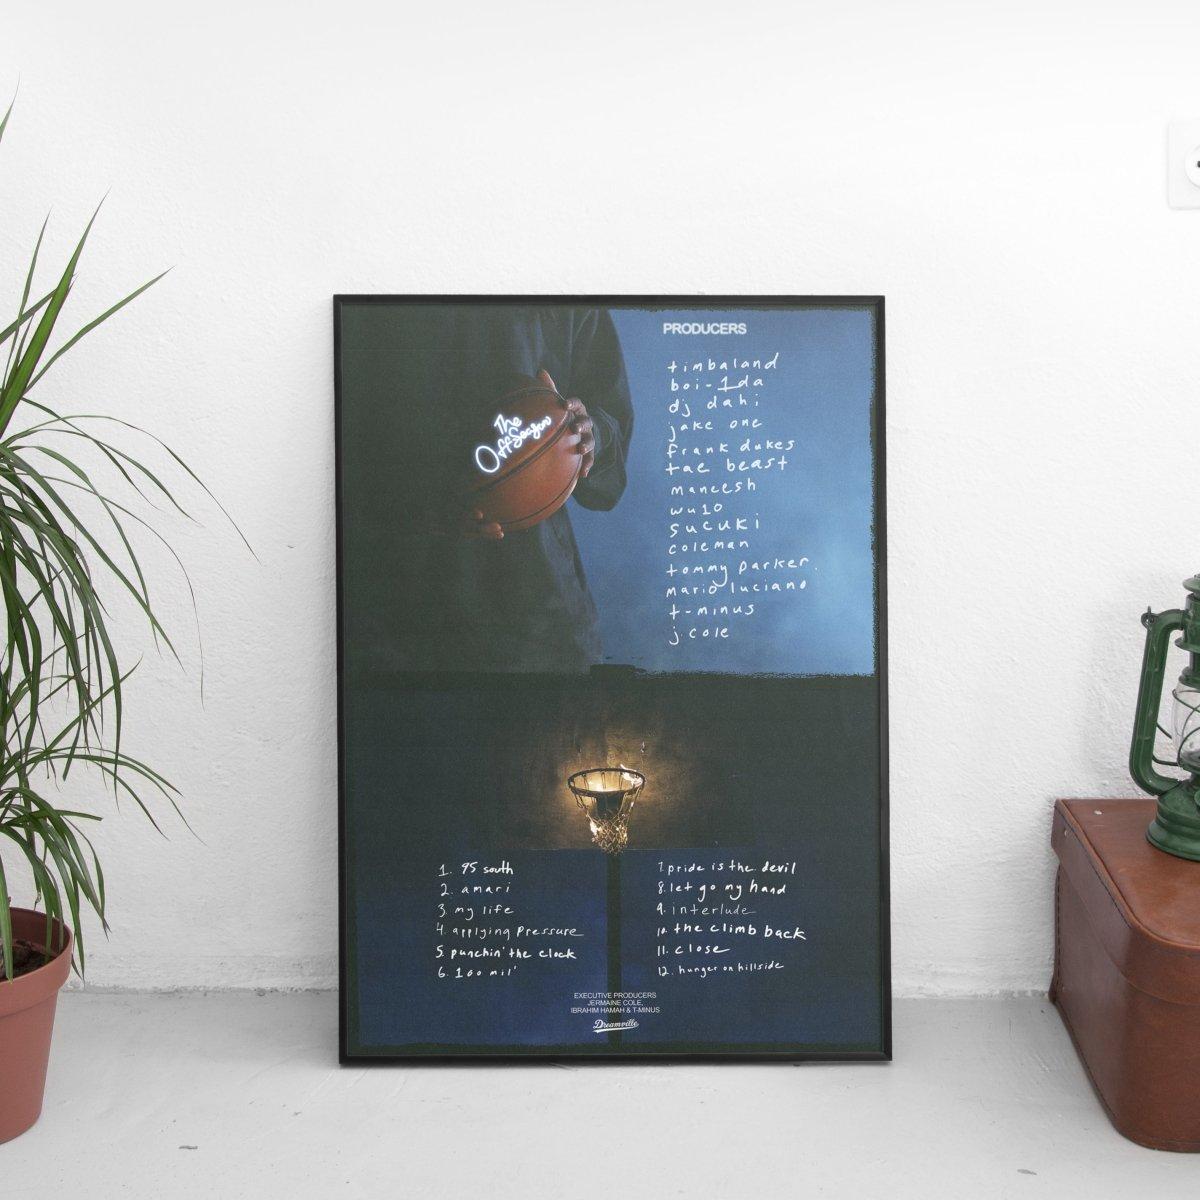 J Cole - The Off-Season Tracklist & Credits Poster